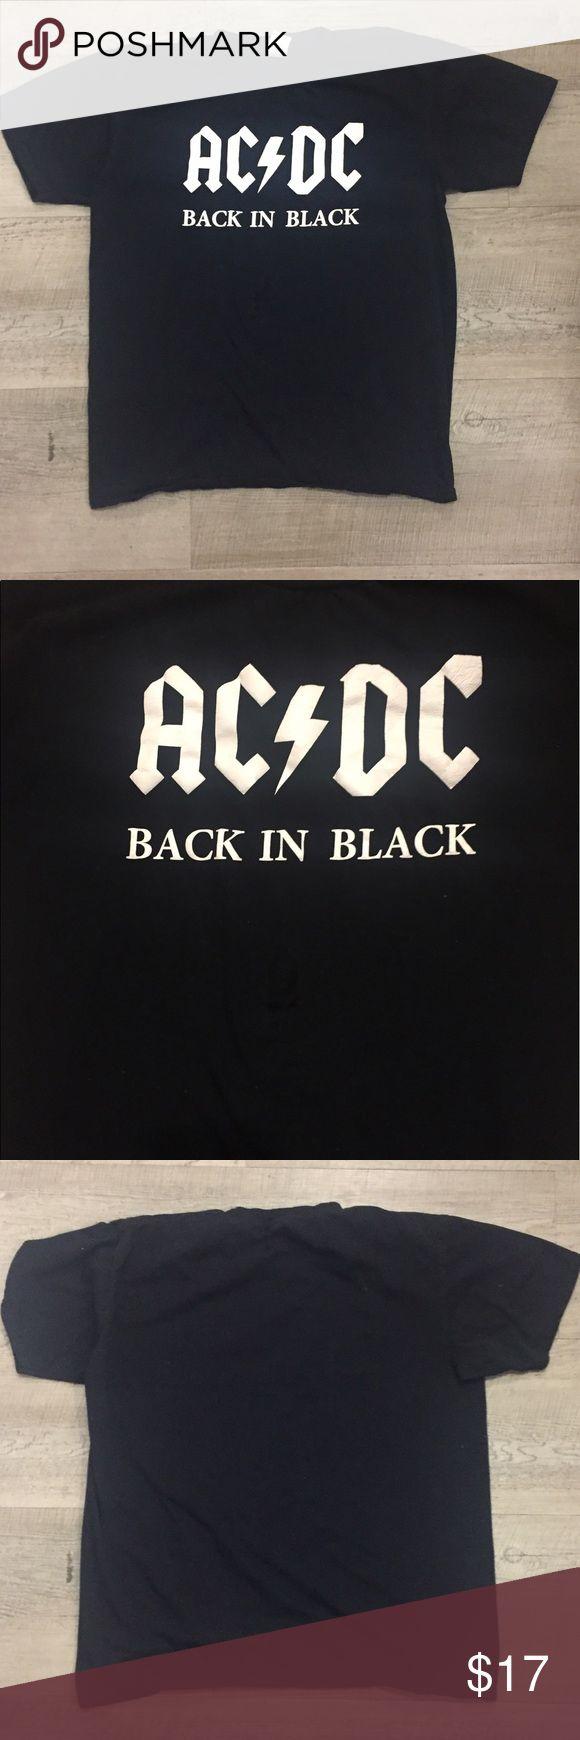 Back in black t shirt - Ac Dc Back In Black Men S Medium T Shirt